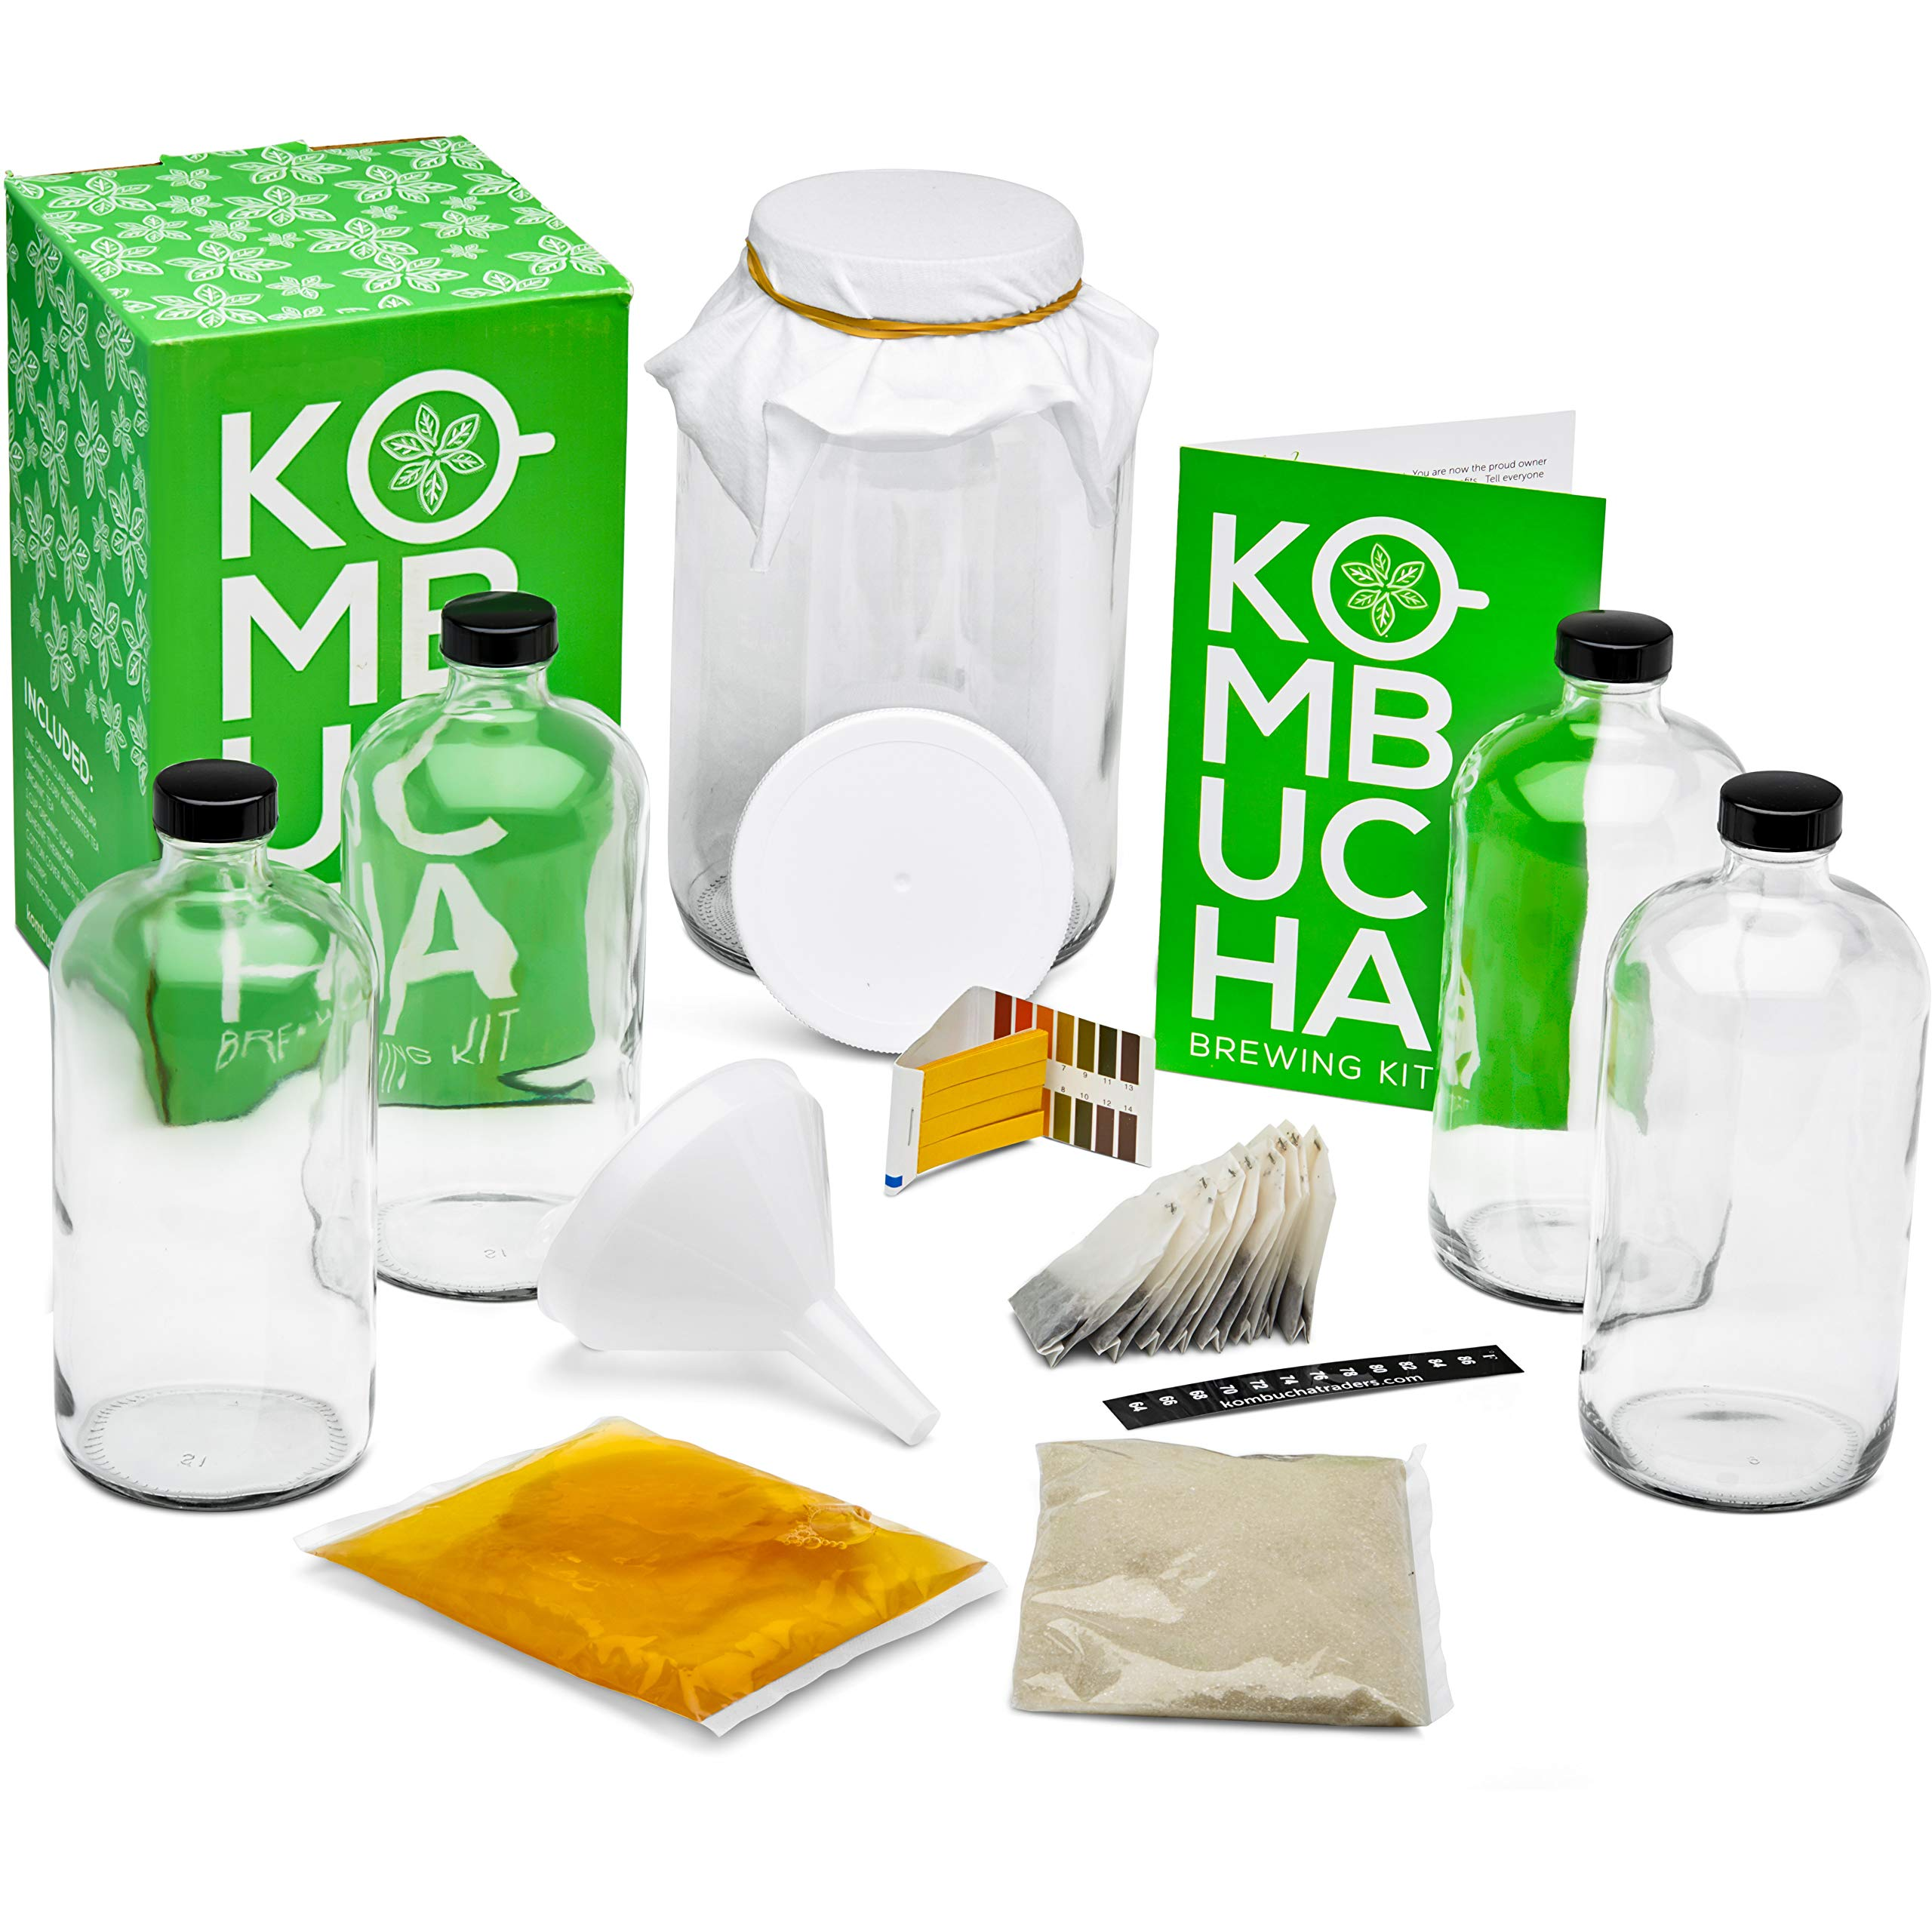 Kitchentoolz Two Phase Kombucha Starter Kit - Kombucha Jar, Kombucha Bottles, Scoby and Basic Ingredients for a Full Kombucha Fermenting and Bottling Experience (Clear Bottles Kit, Glass)